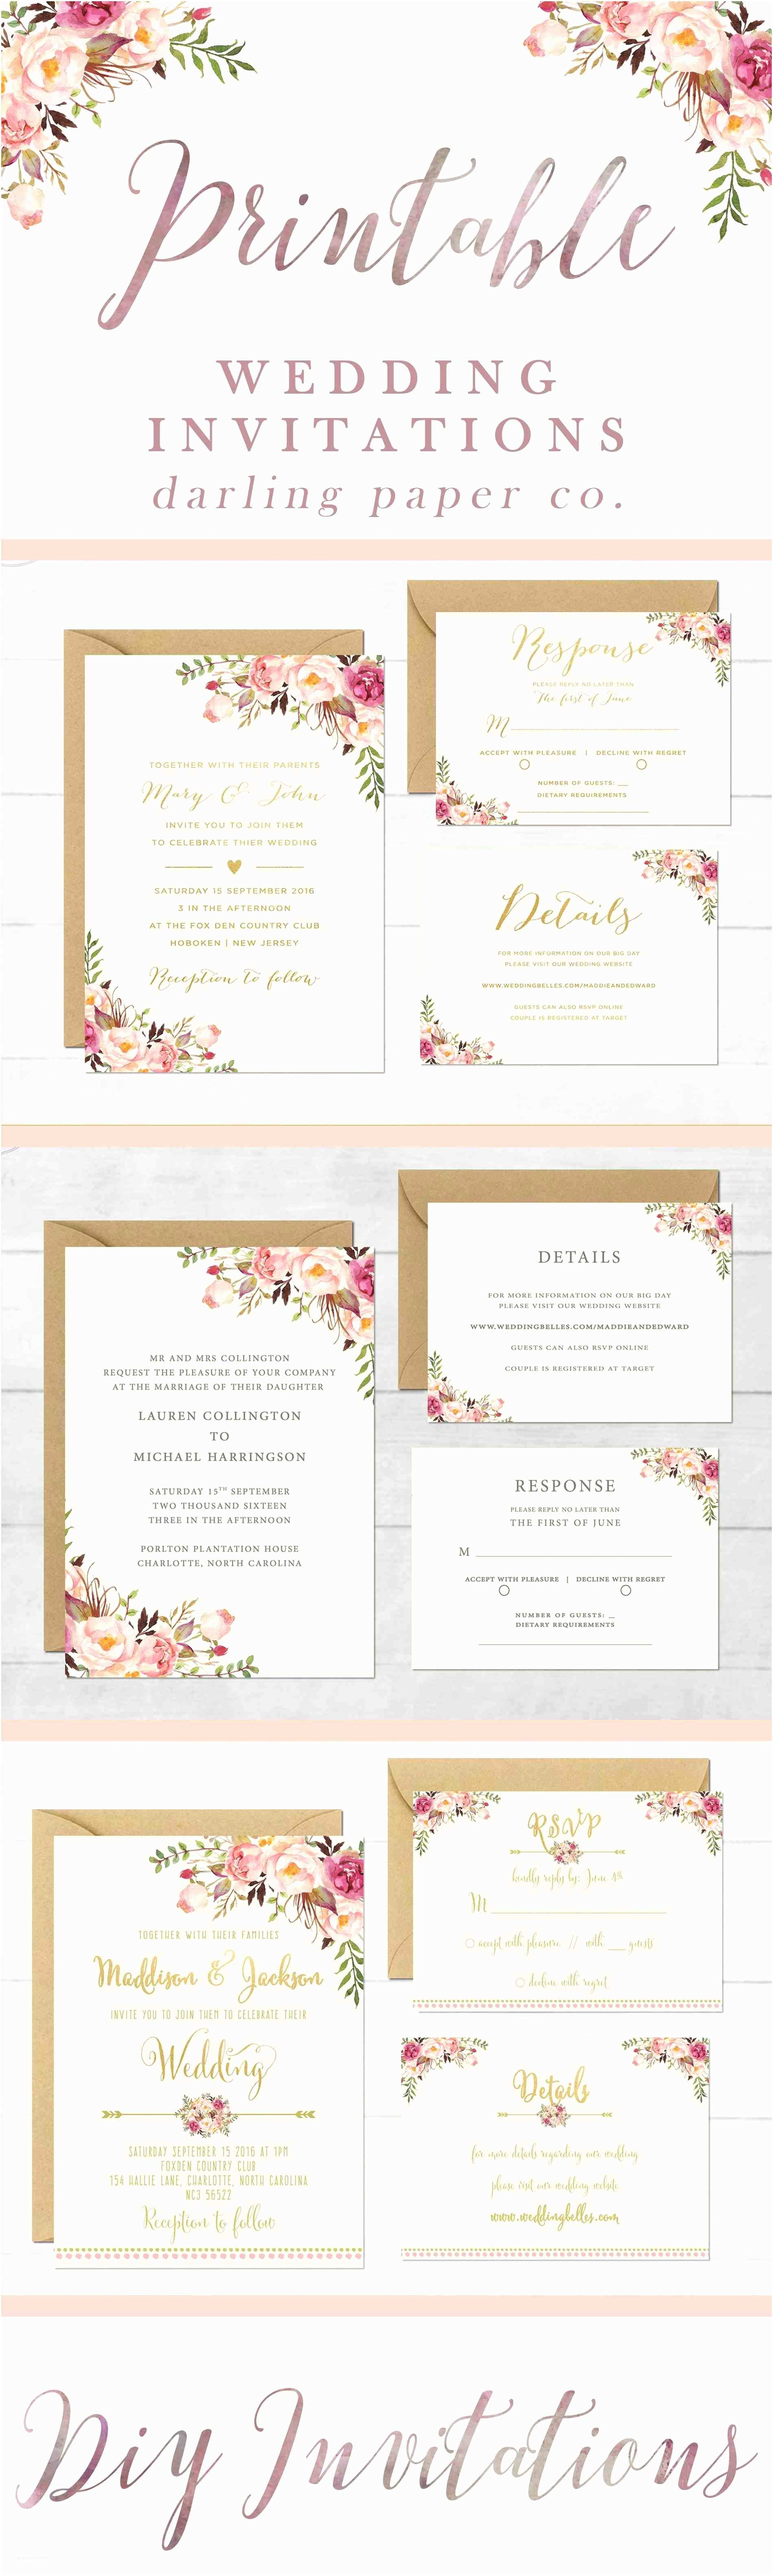 Wedding Invitations Online Programs Modern Blank Wedding Invitations Templates Gold